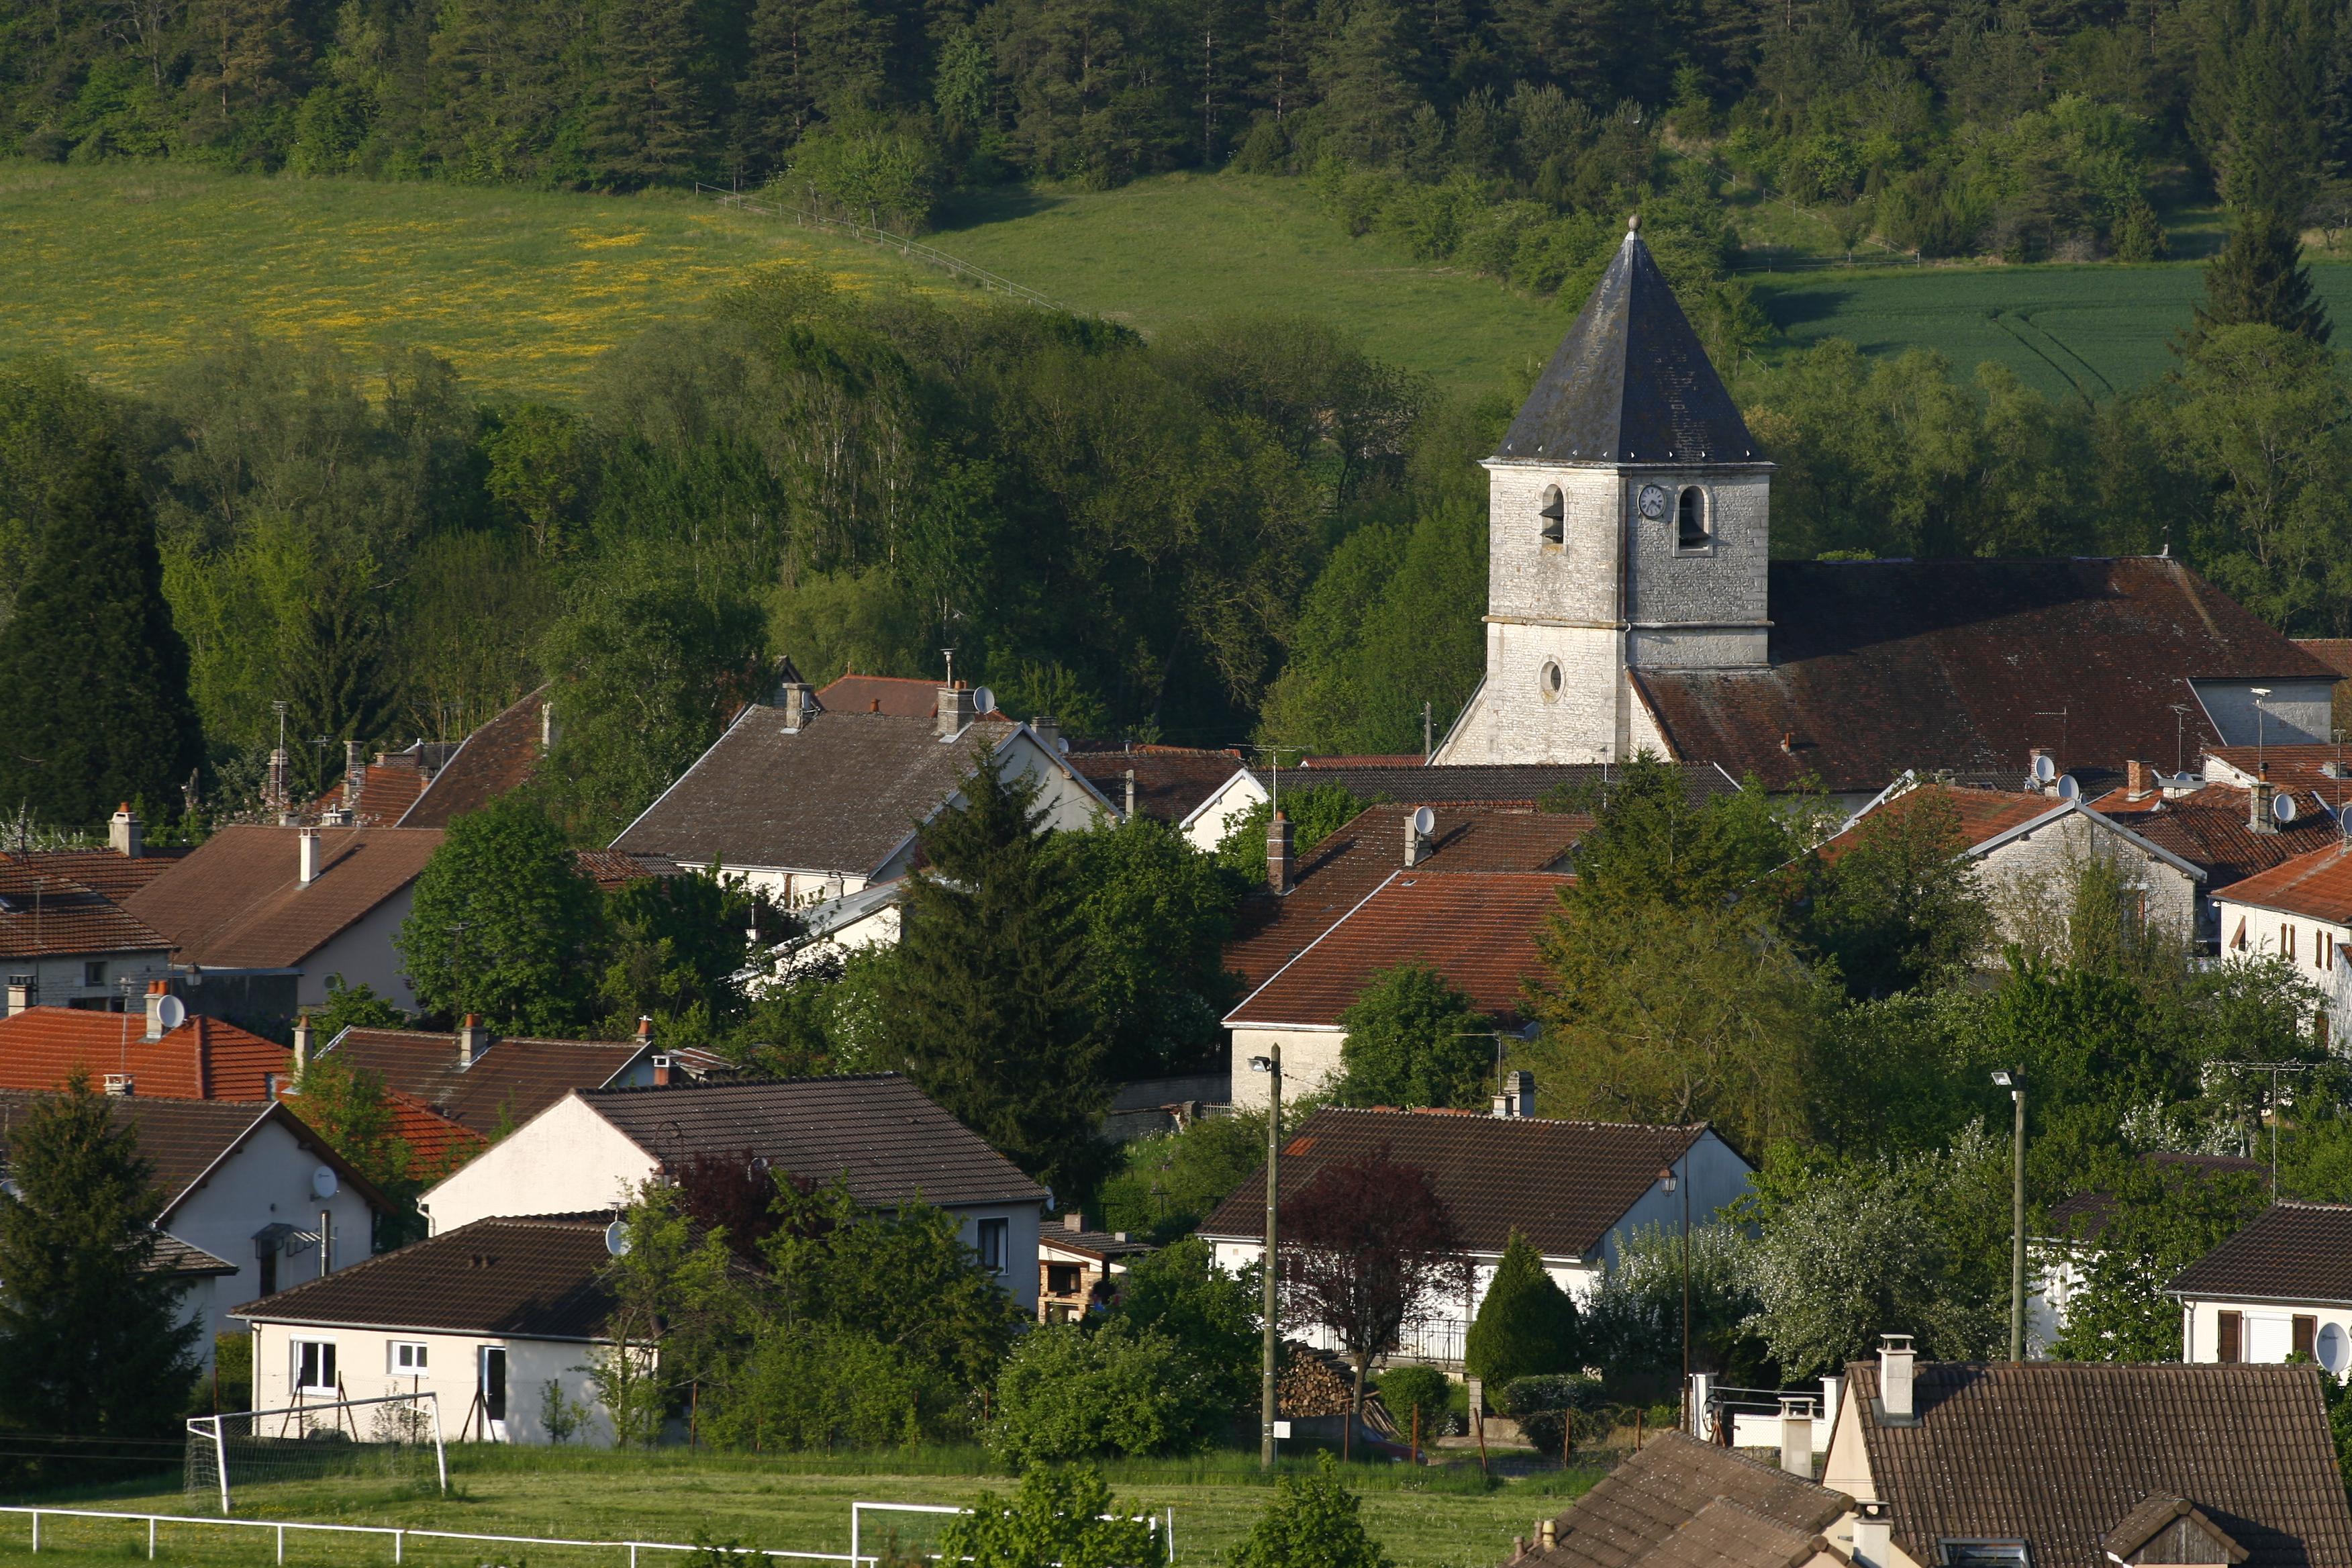 Longchamp-sur-Aujon